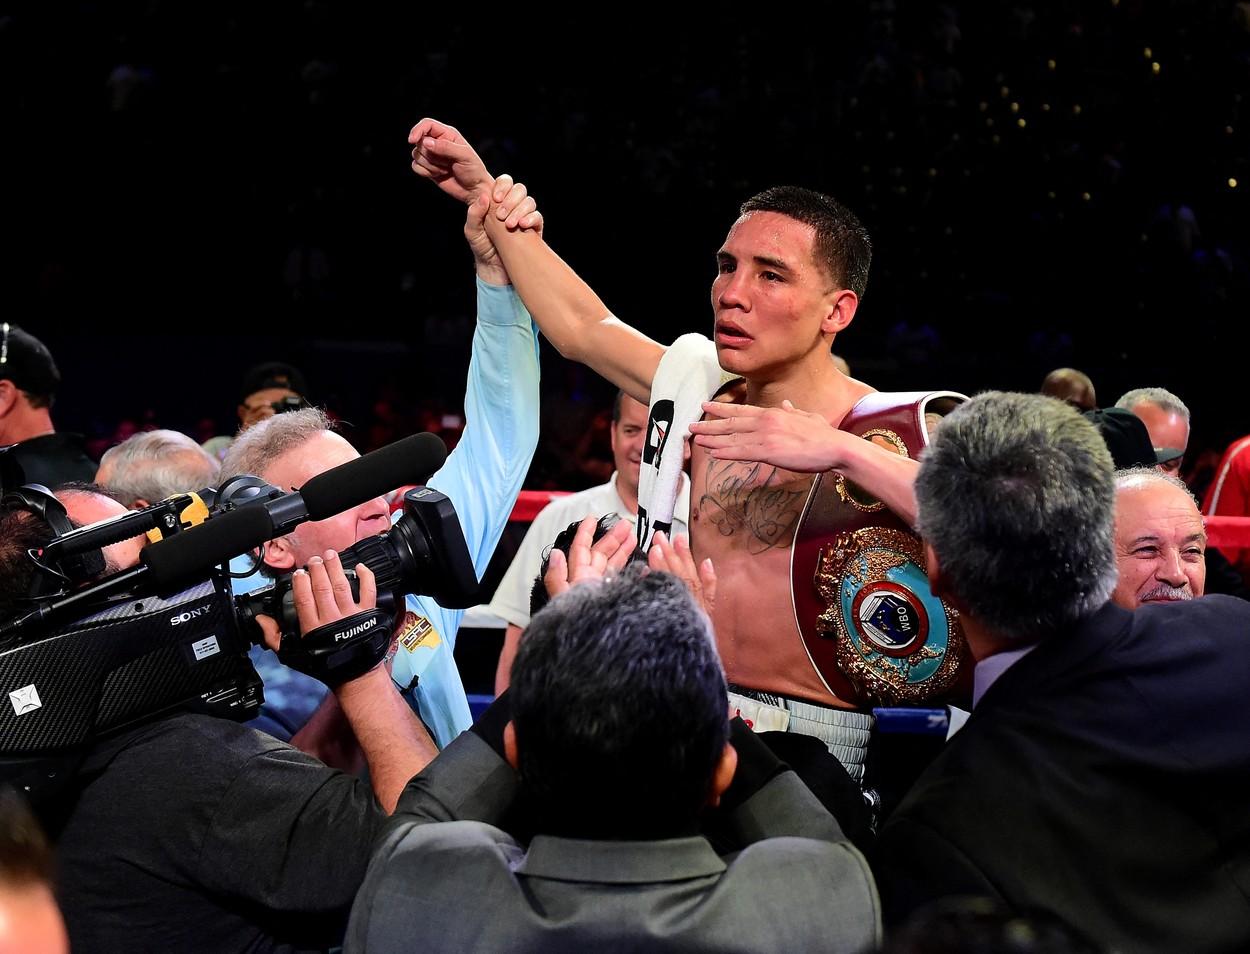 Oscar Valdez din echipa lui Canelo a picat testul anti-doping